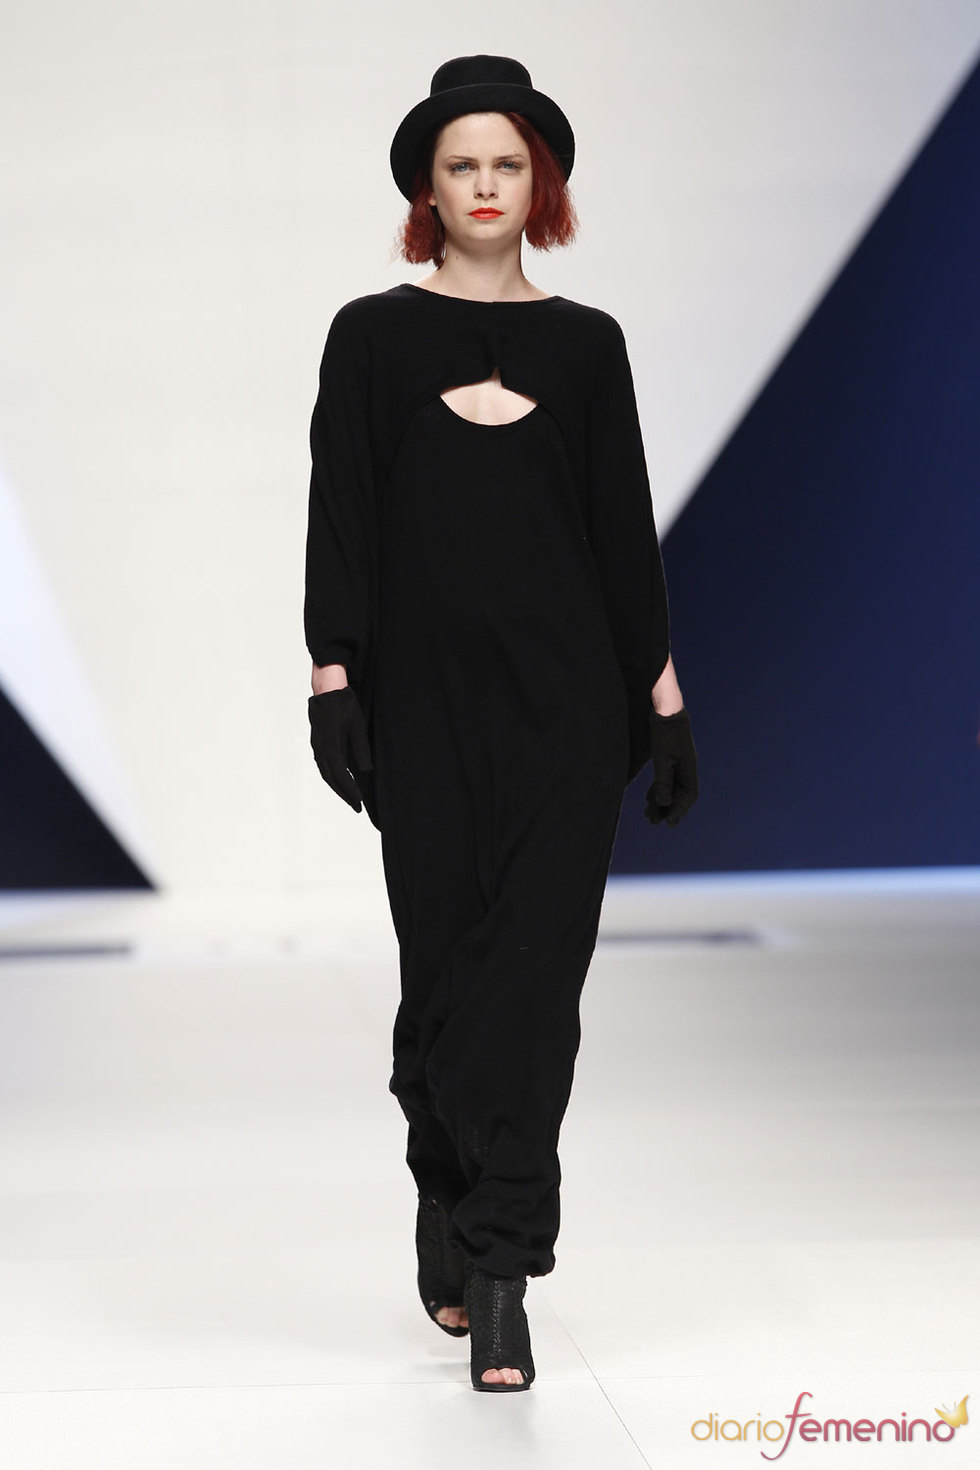 Anjara - Moda en negro - Cibeles Fashion Week 2010